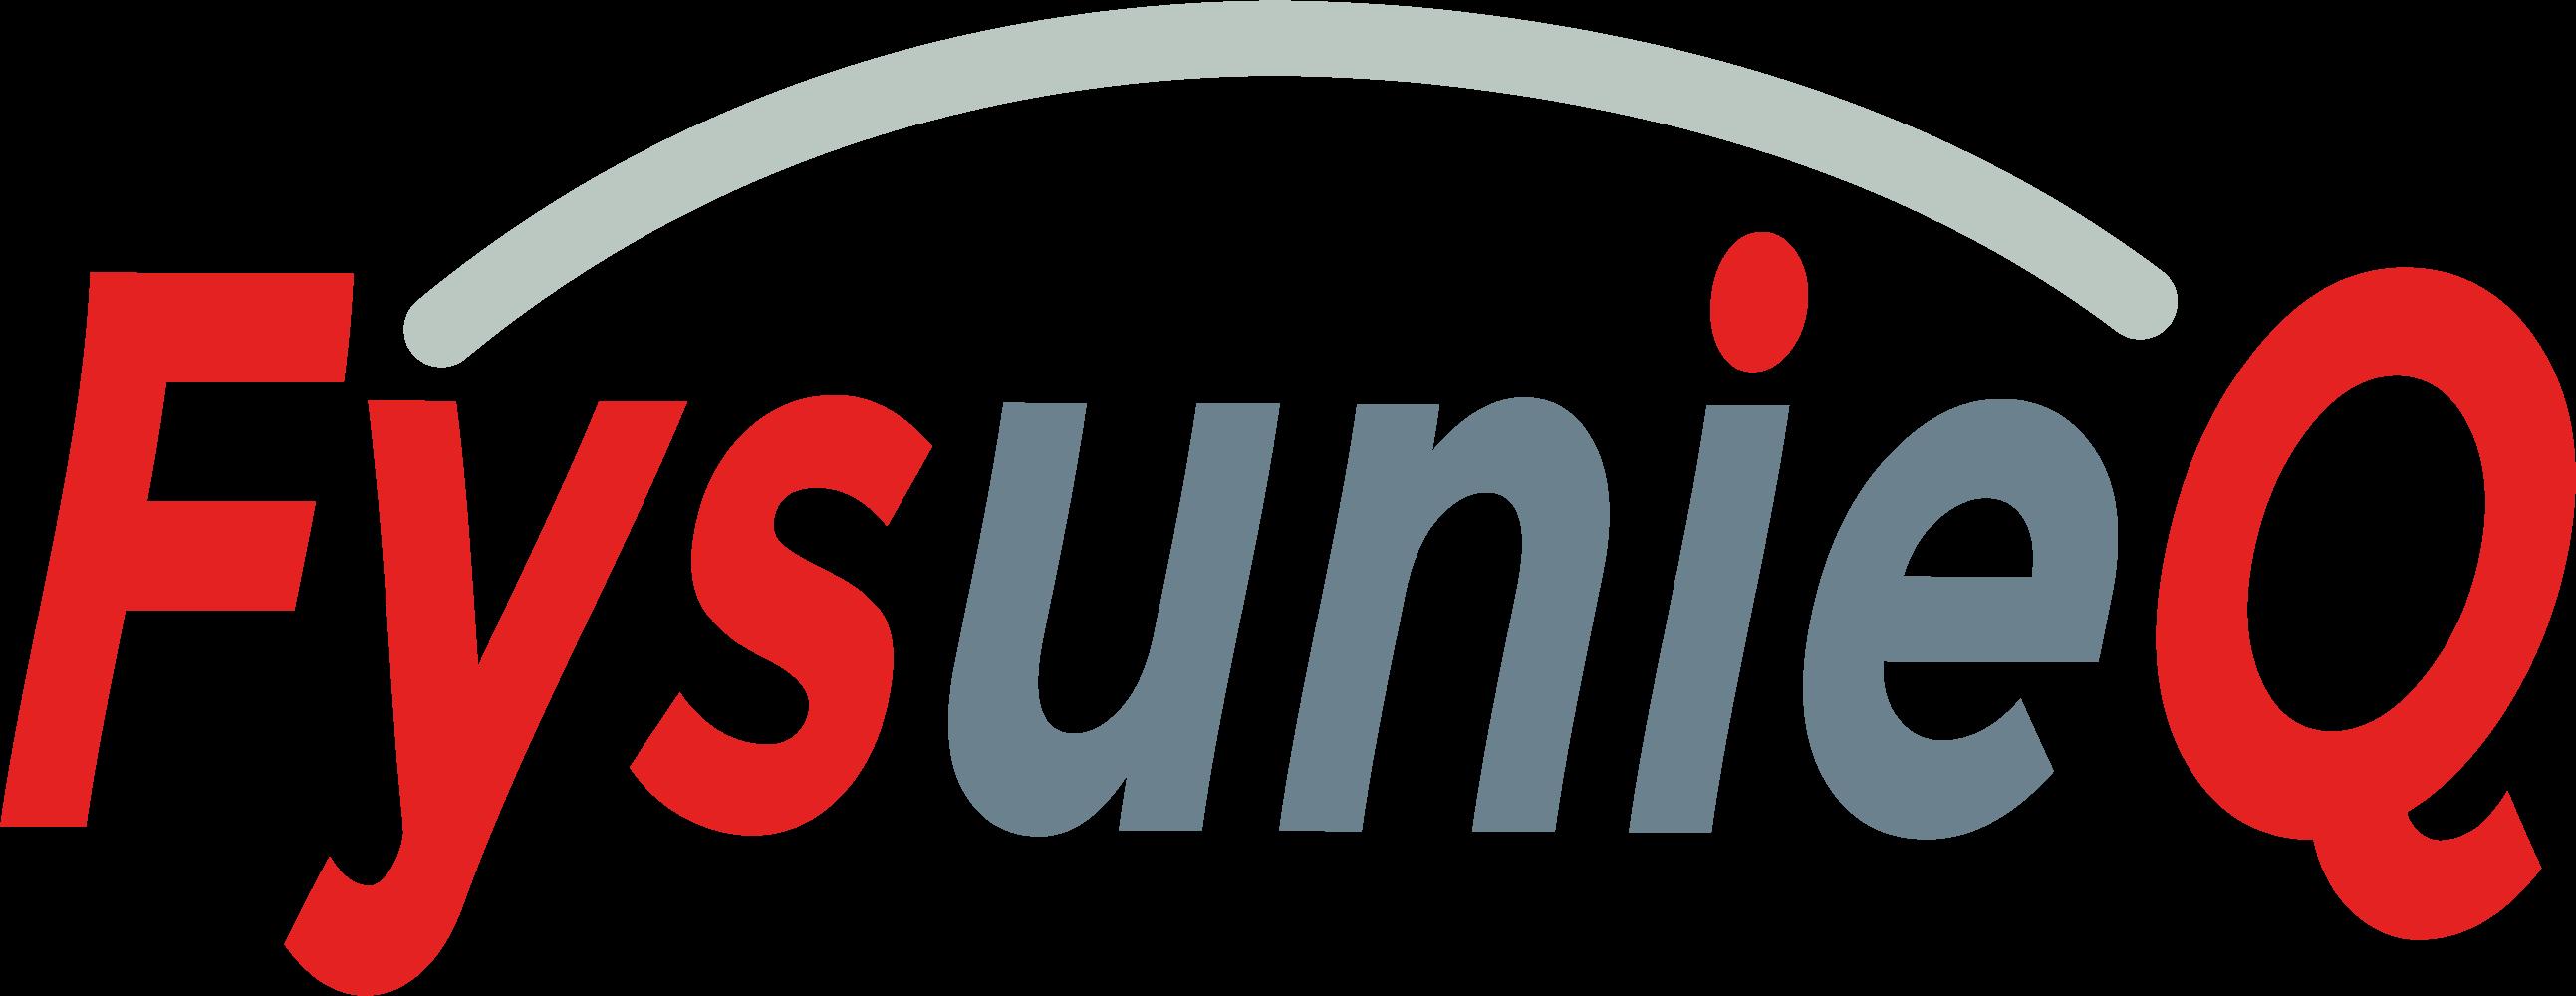 fysunieq logo klein 2016